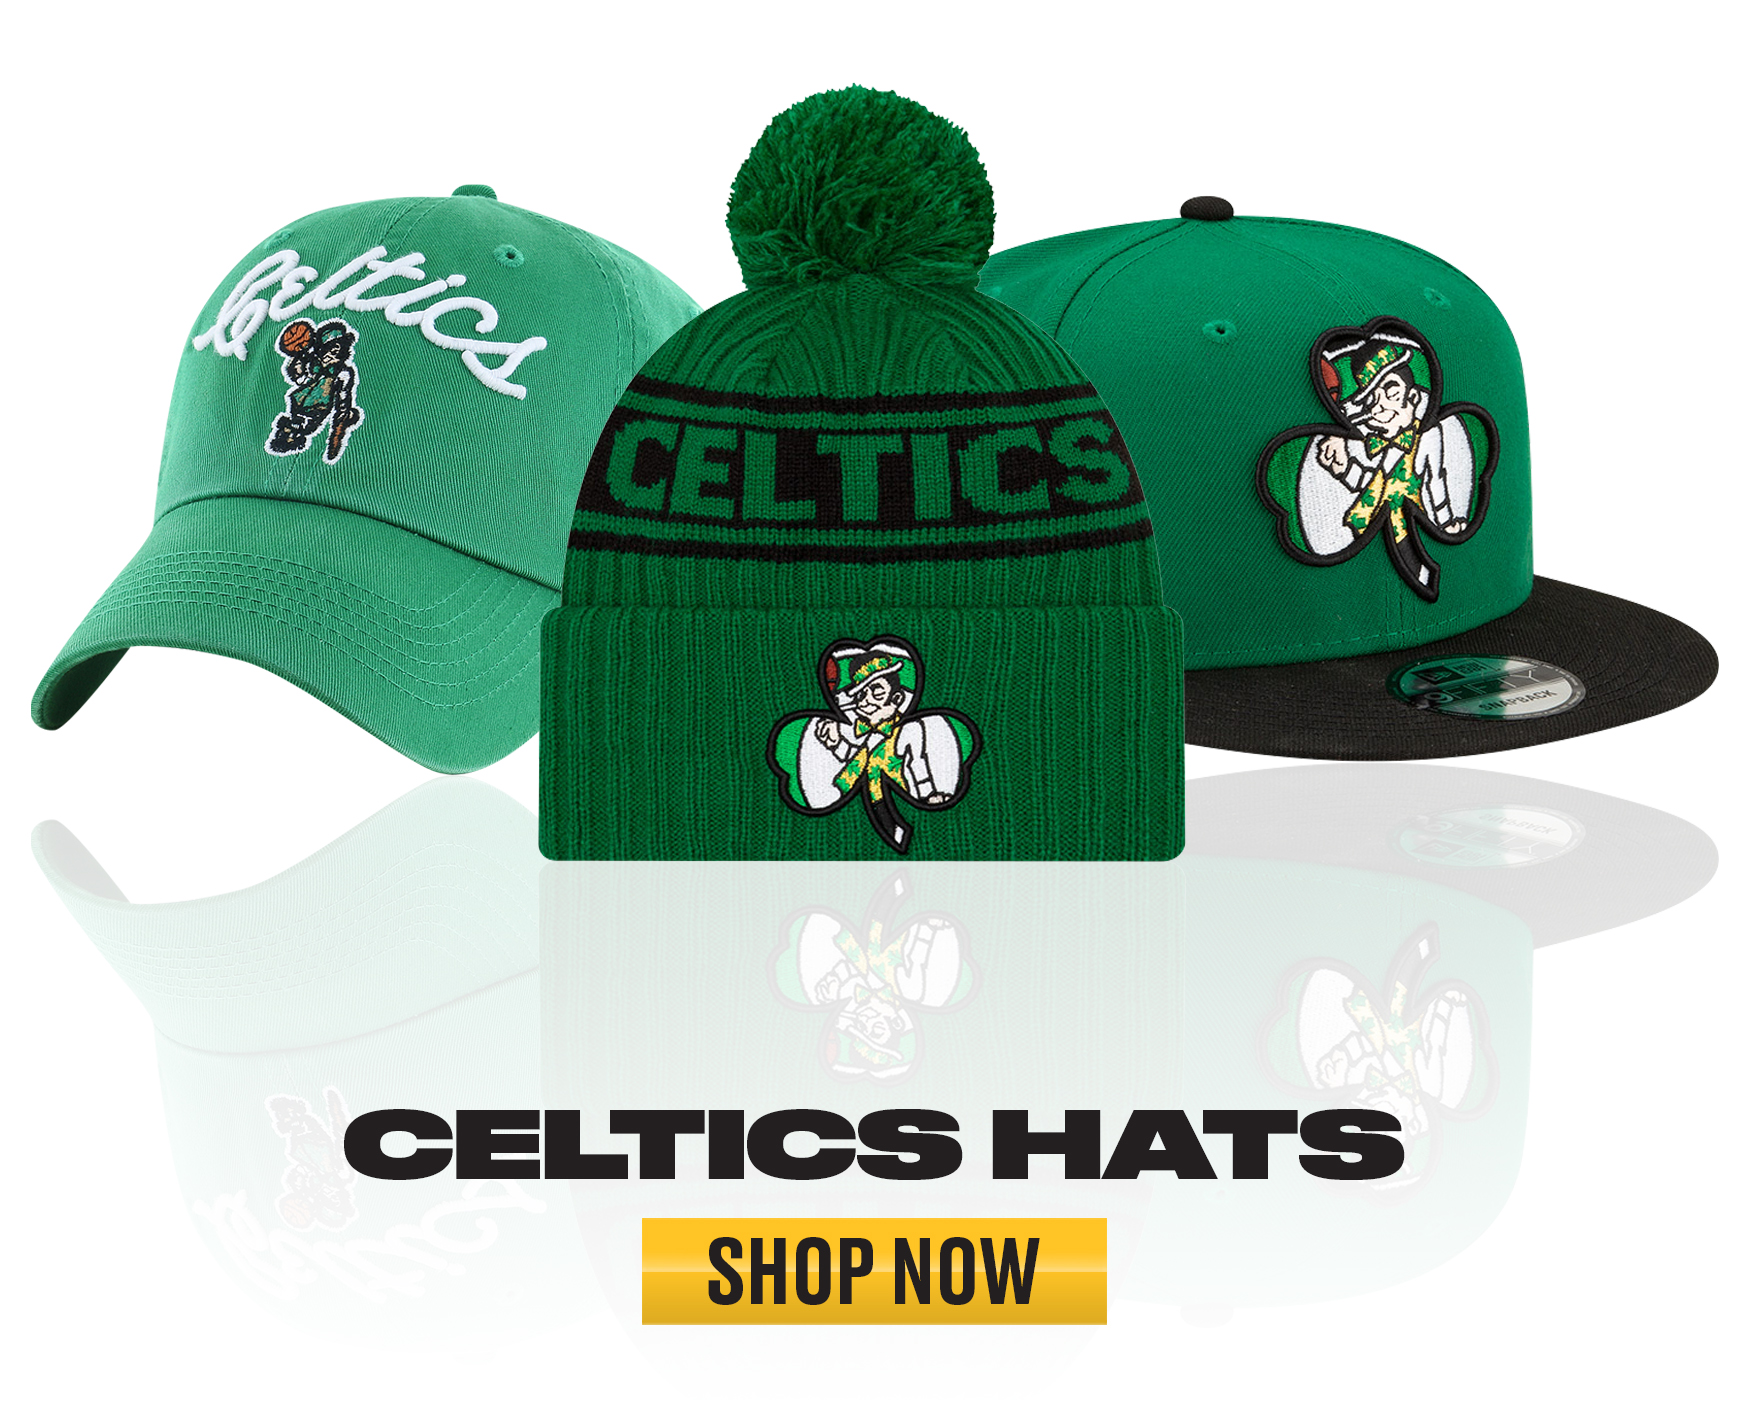 Celtics Hats